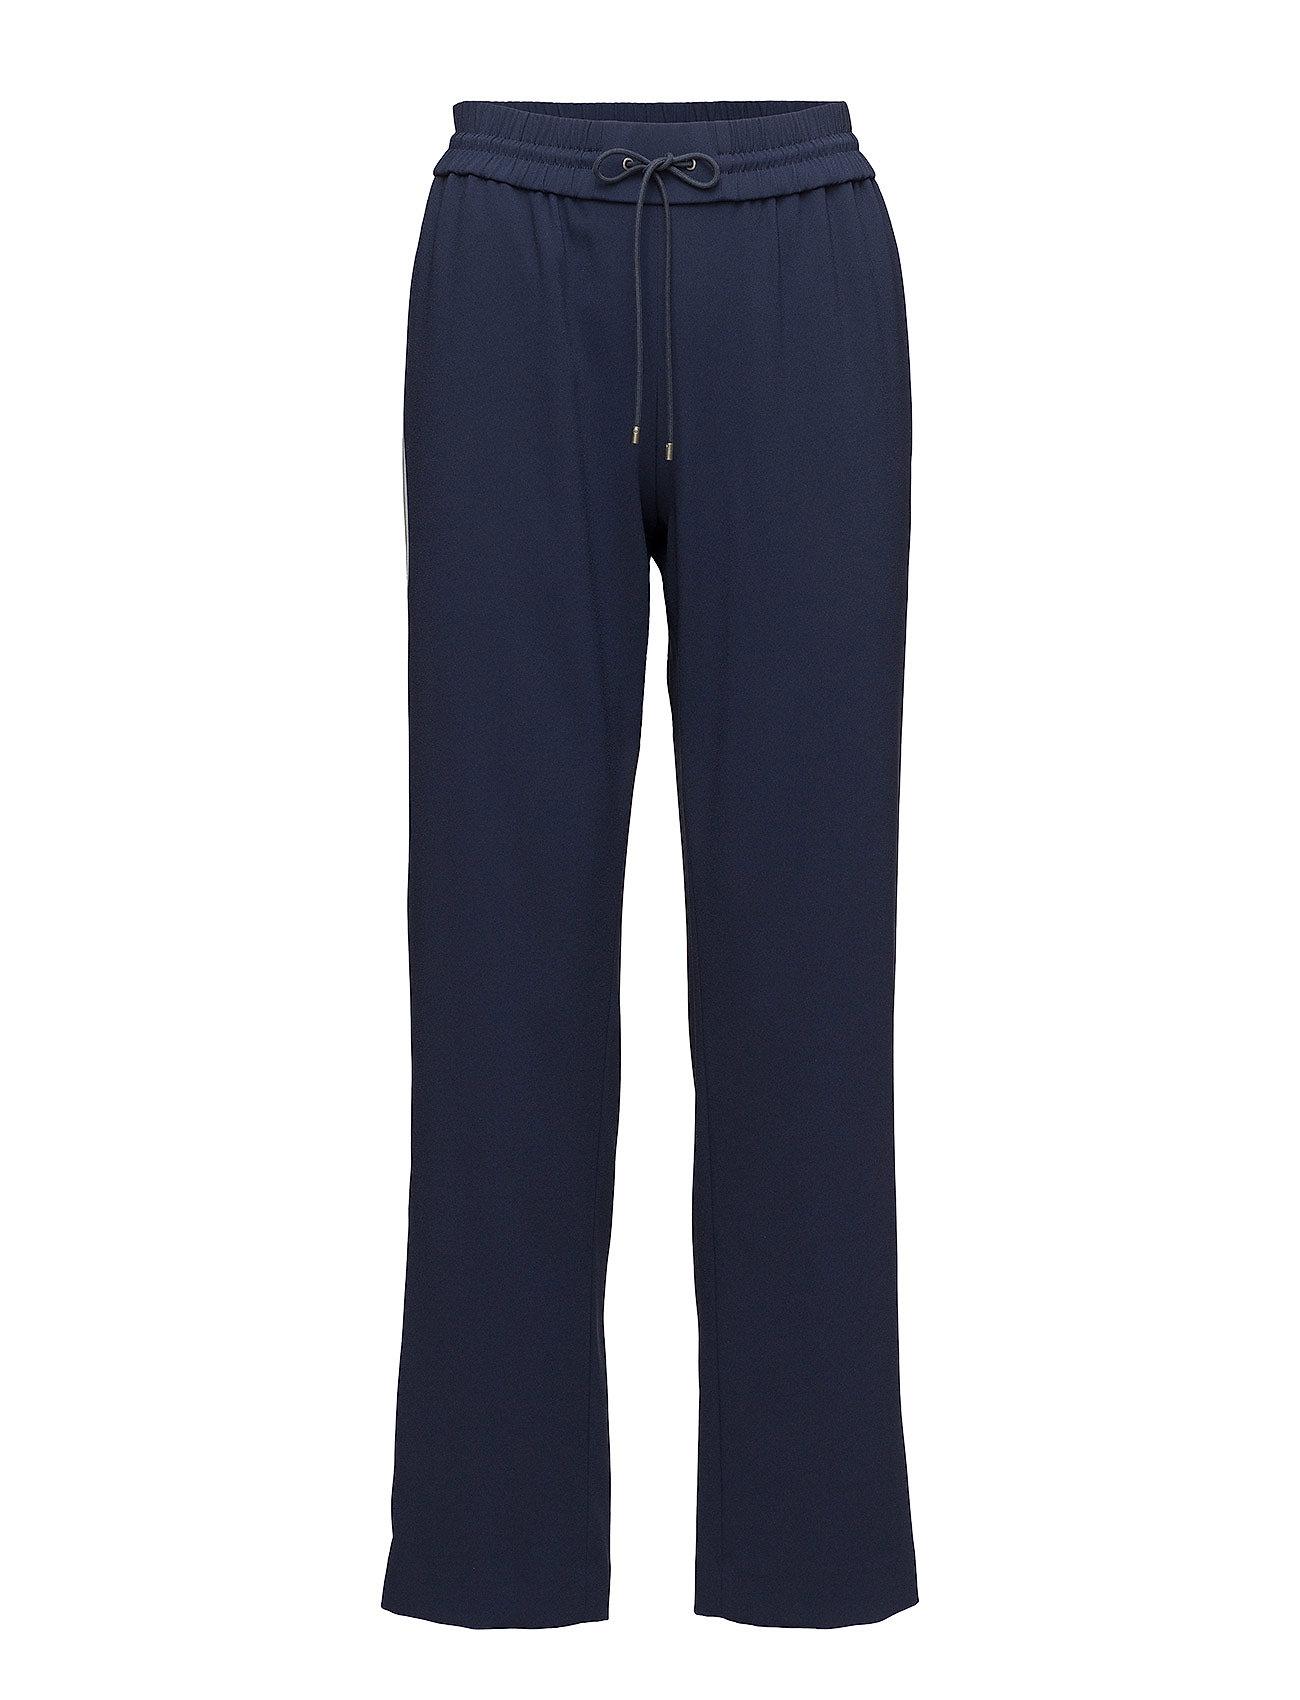 Kenzo Trousers Main Byxor